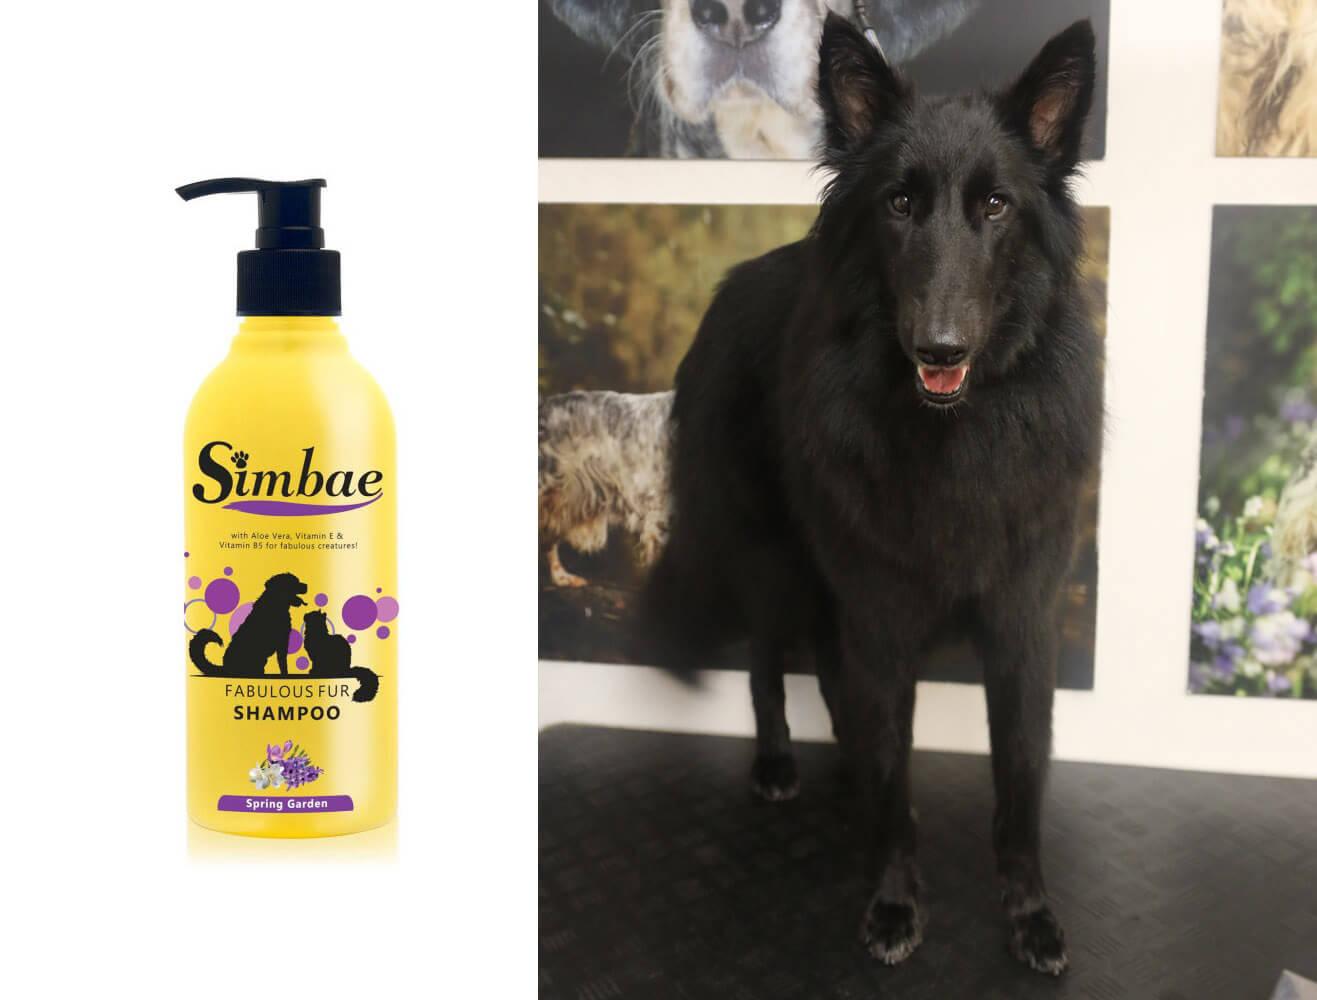 matlock dog groomers